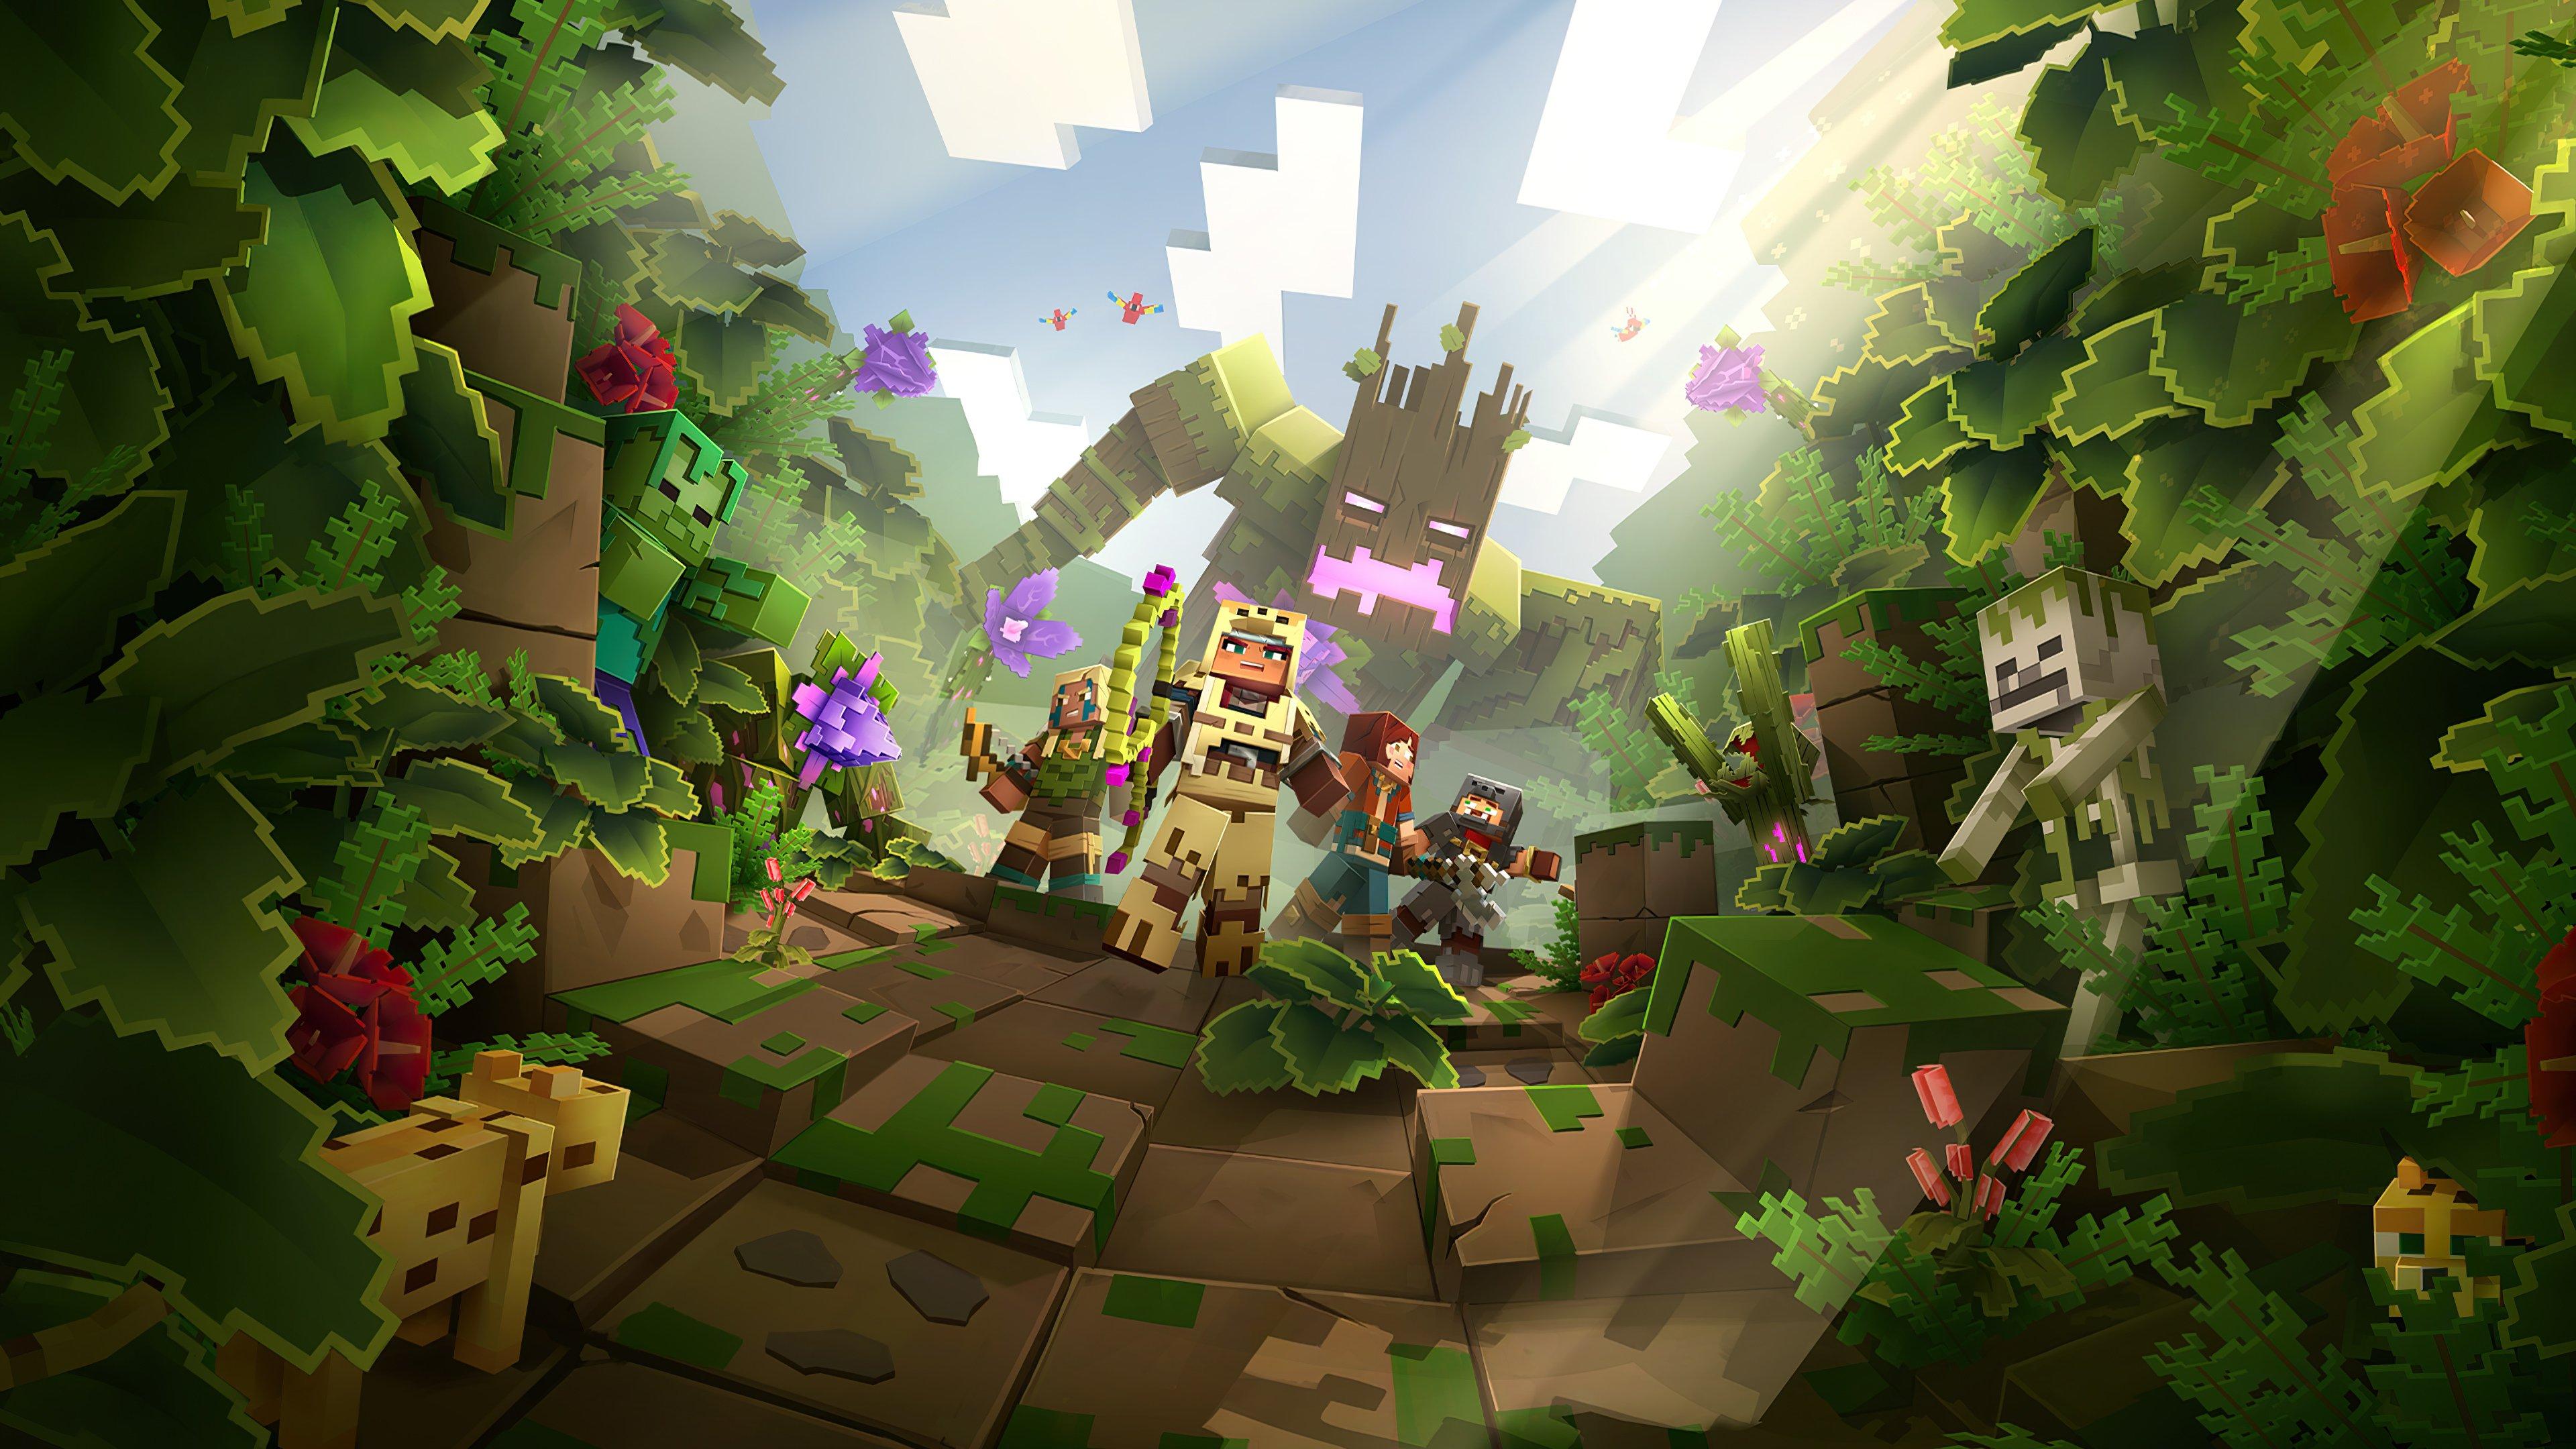 Fondos de pantalla Minecraft Dungens Jungle Awaens Hero